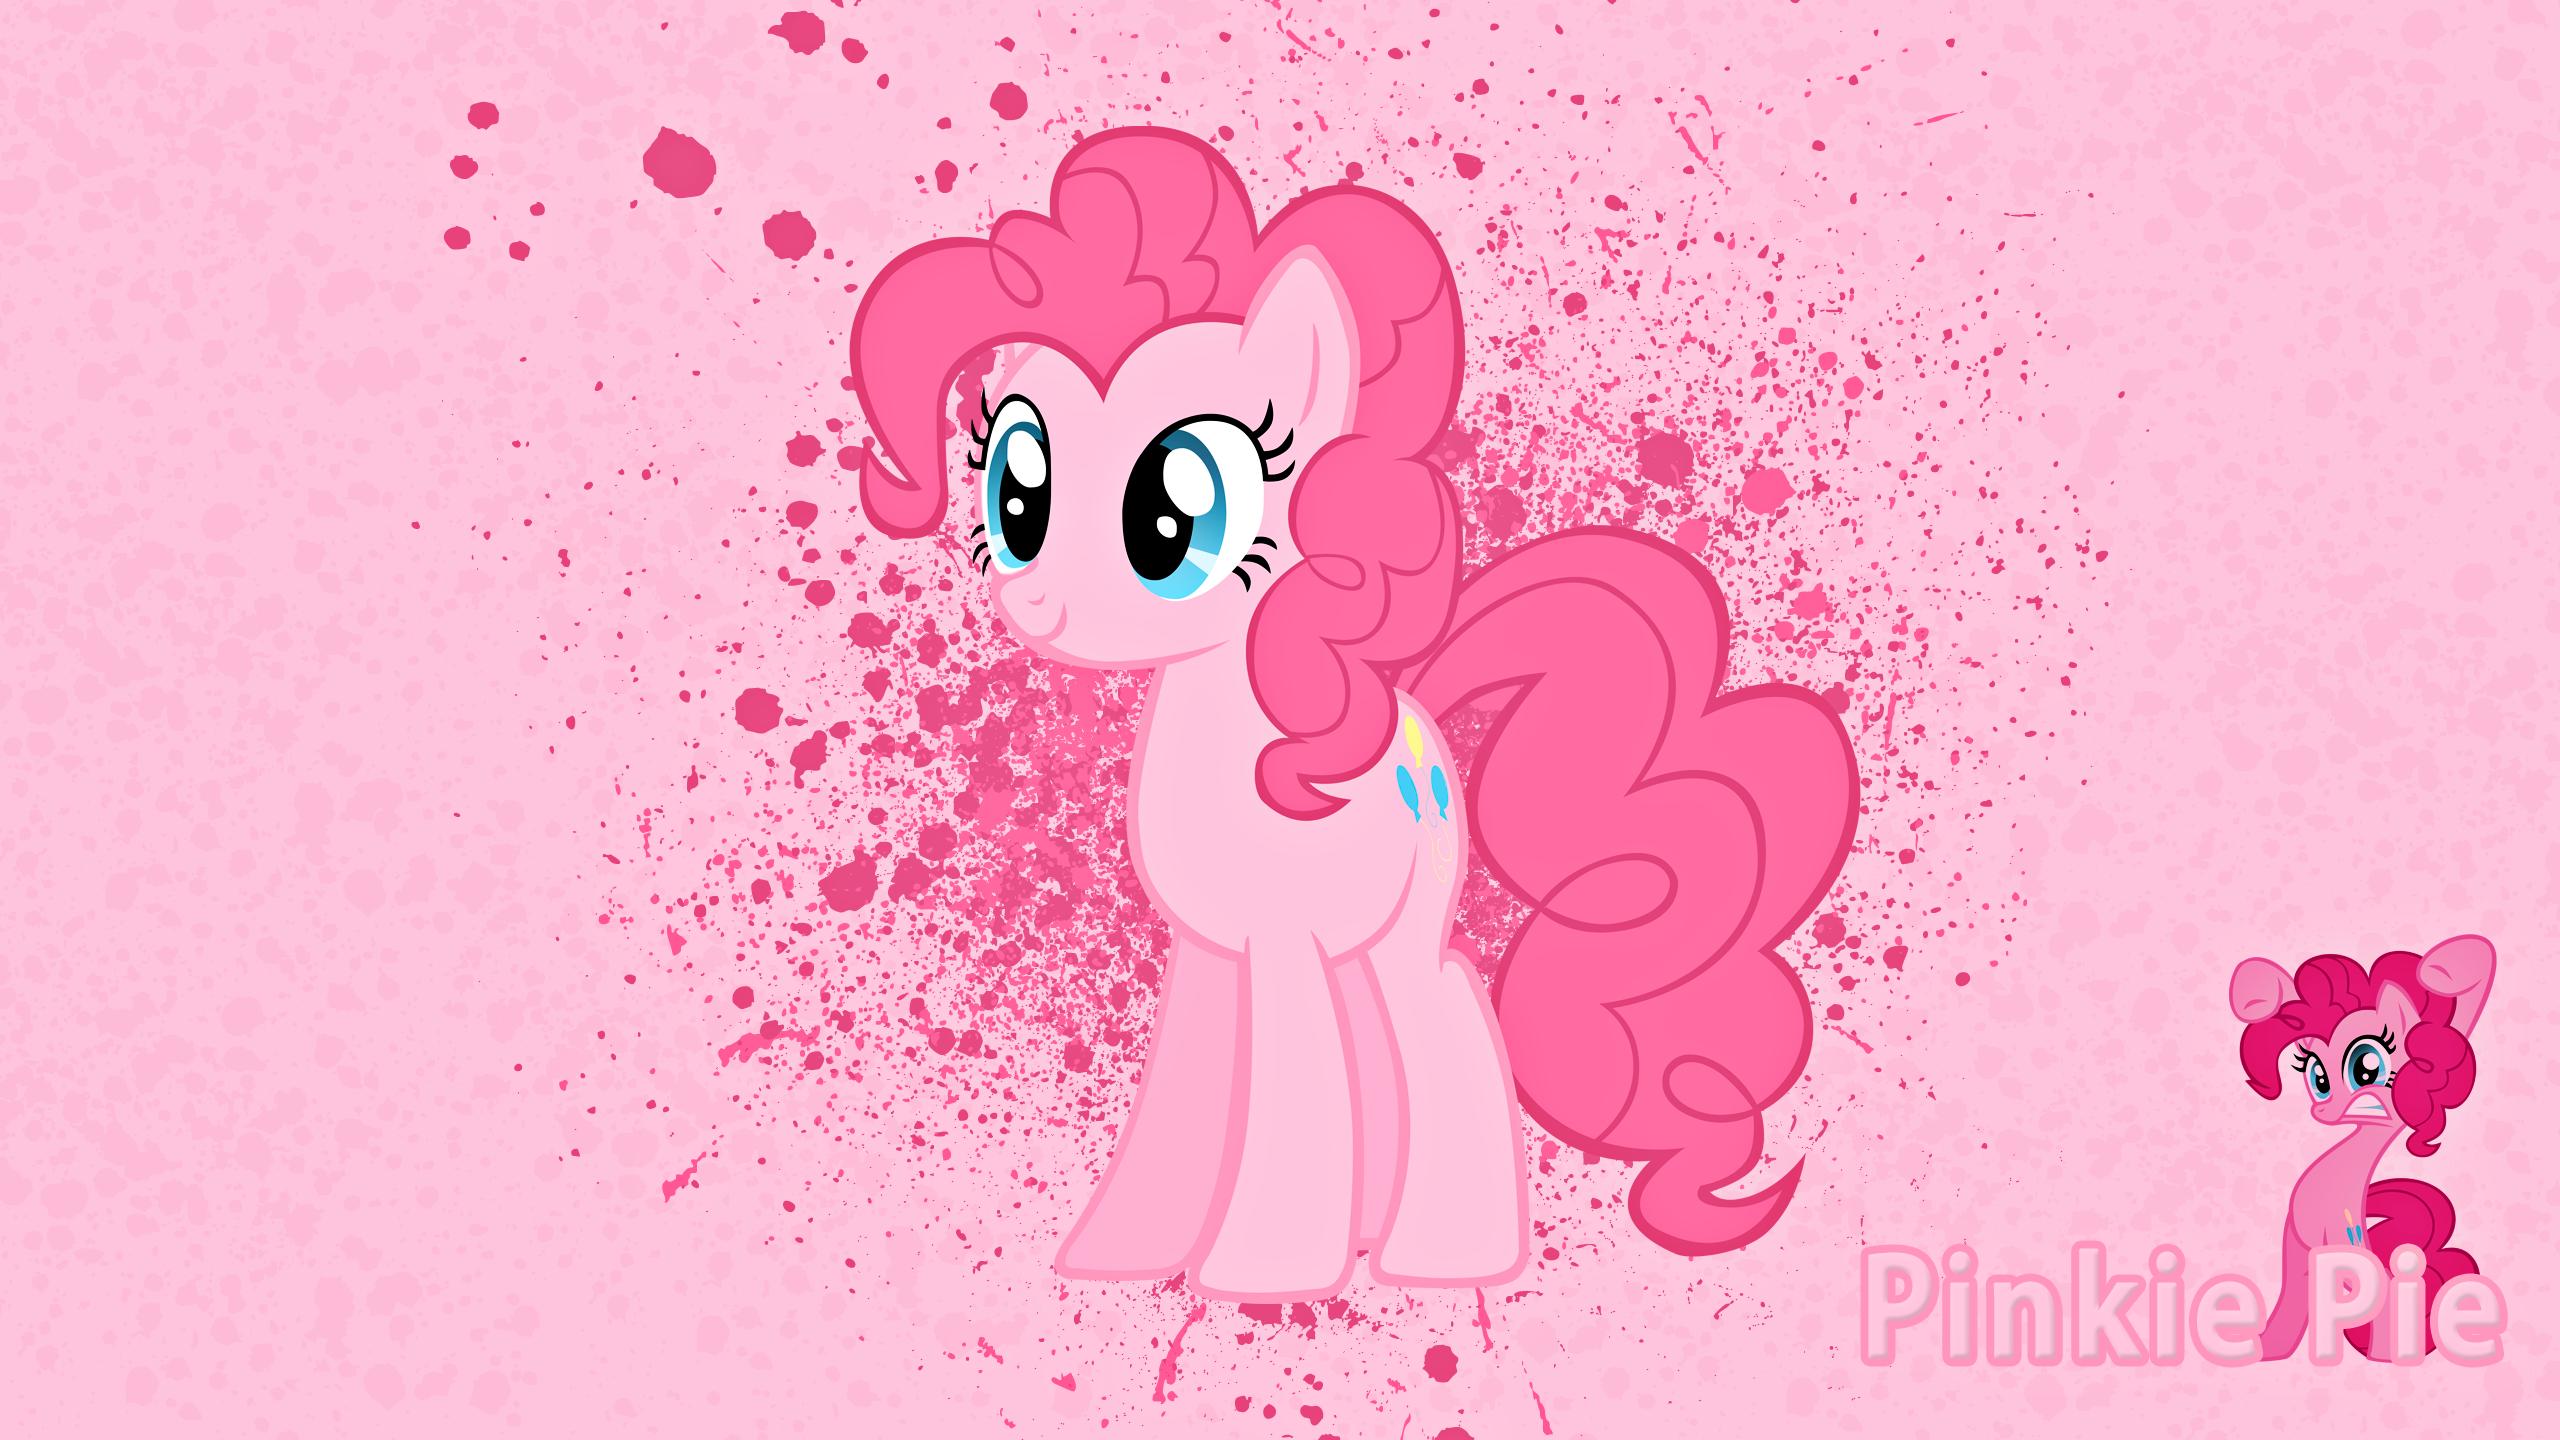 Pinkie Pie Ink Splatter Wallpaper by alanfernandoflores01 and Peachspices